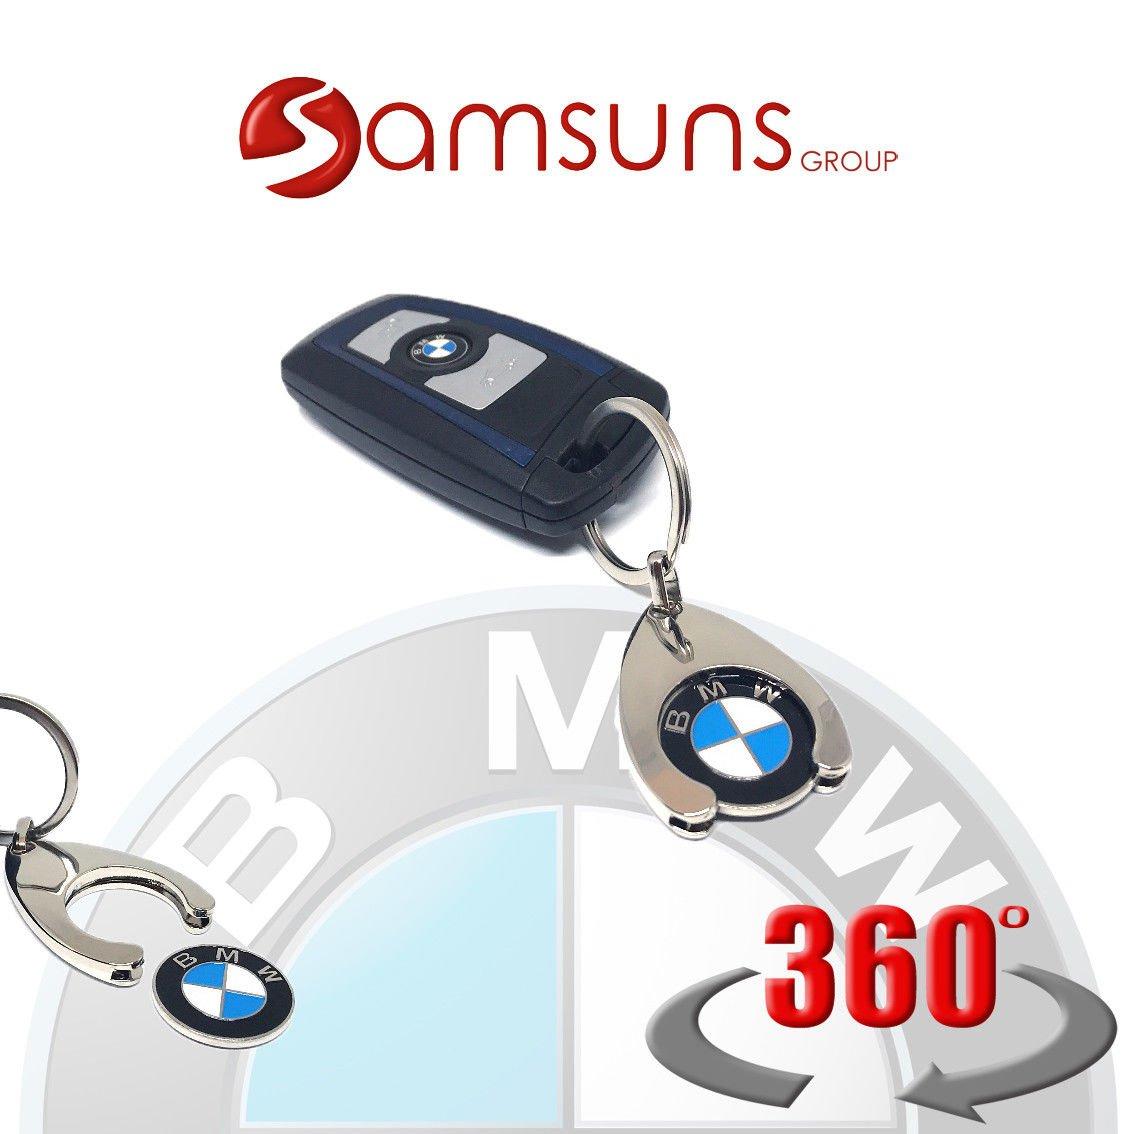 2 x Key Fob with Shopping Trolley Chip Original Mercedes-Benz